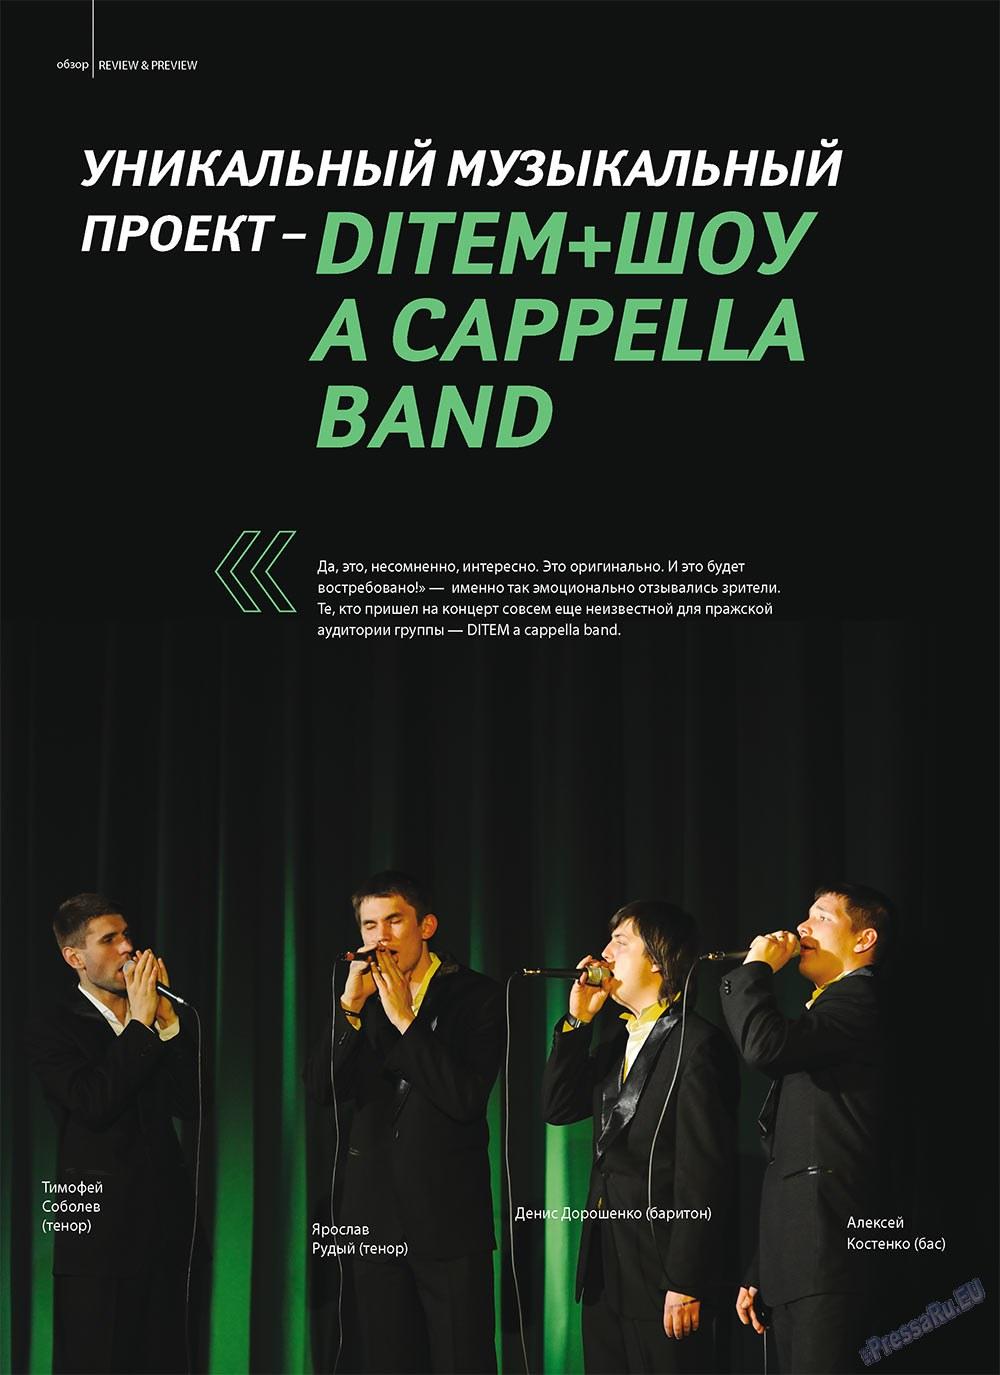 Артек (журнал). 2011 год, номер 2, стр. 6